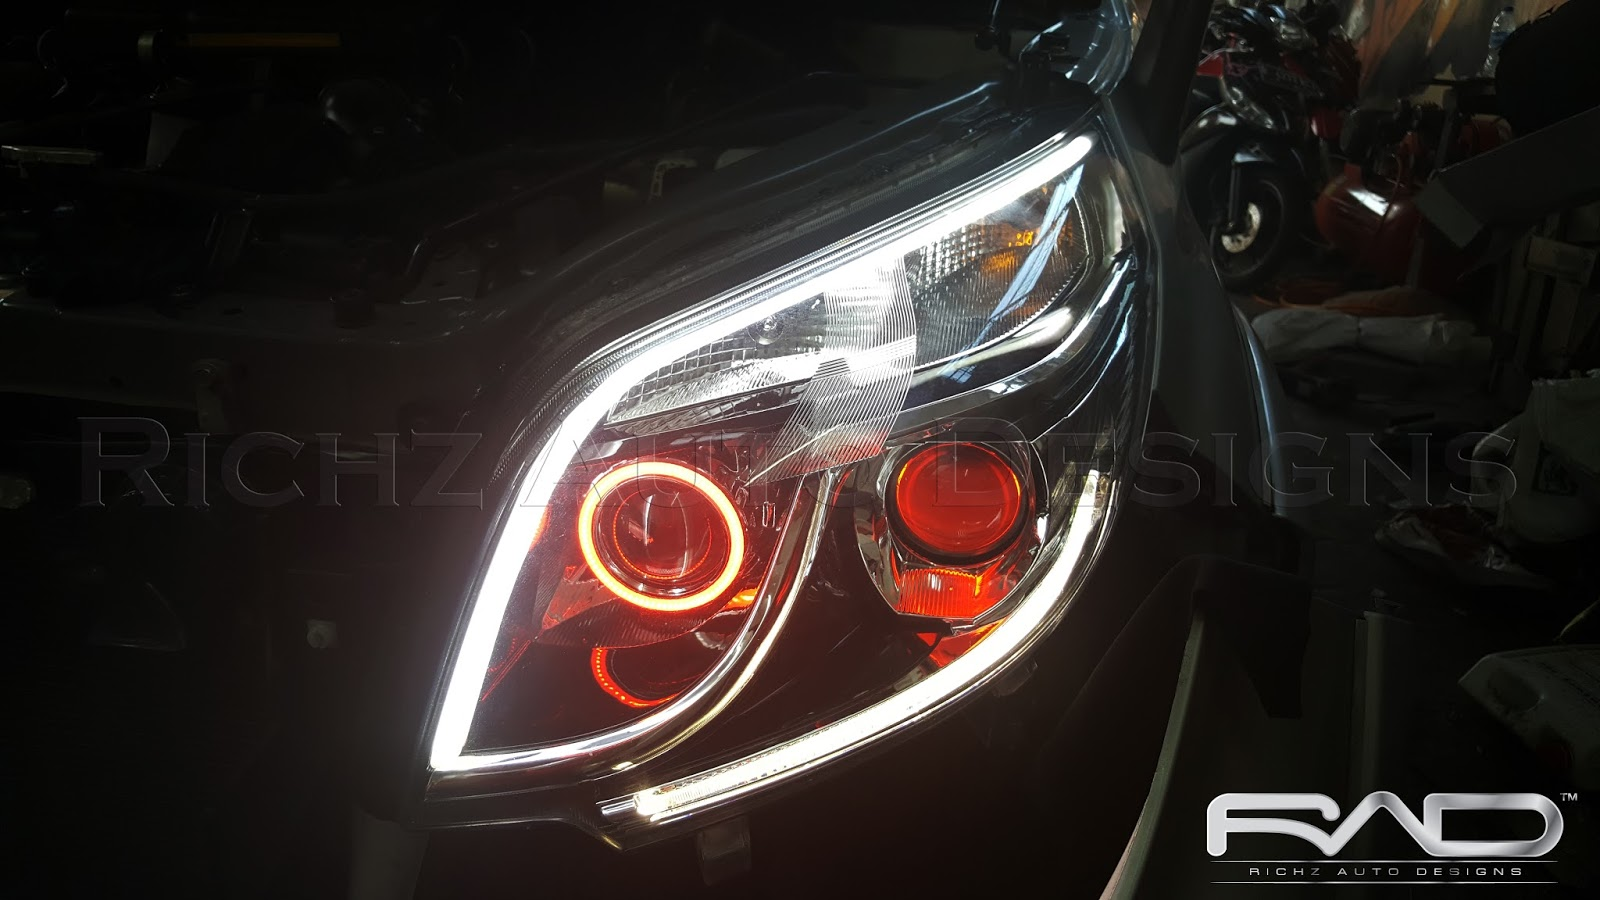 Richz Auto Designs Custom Headlamp Stoplamp